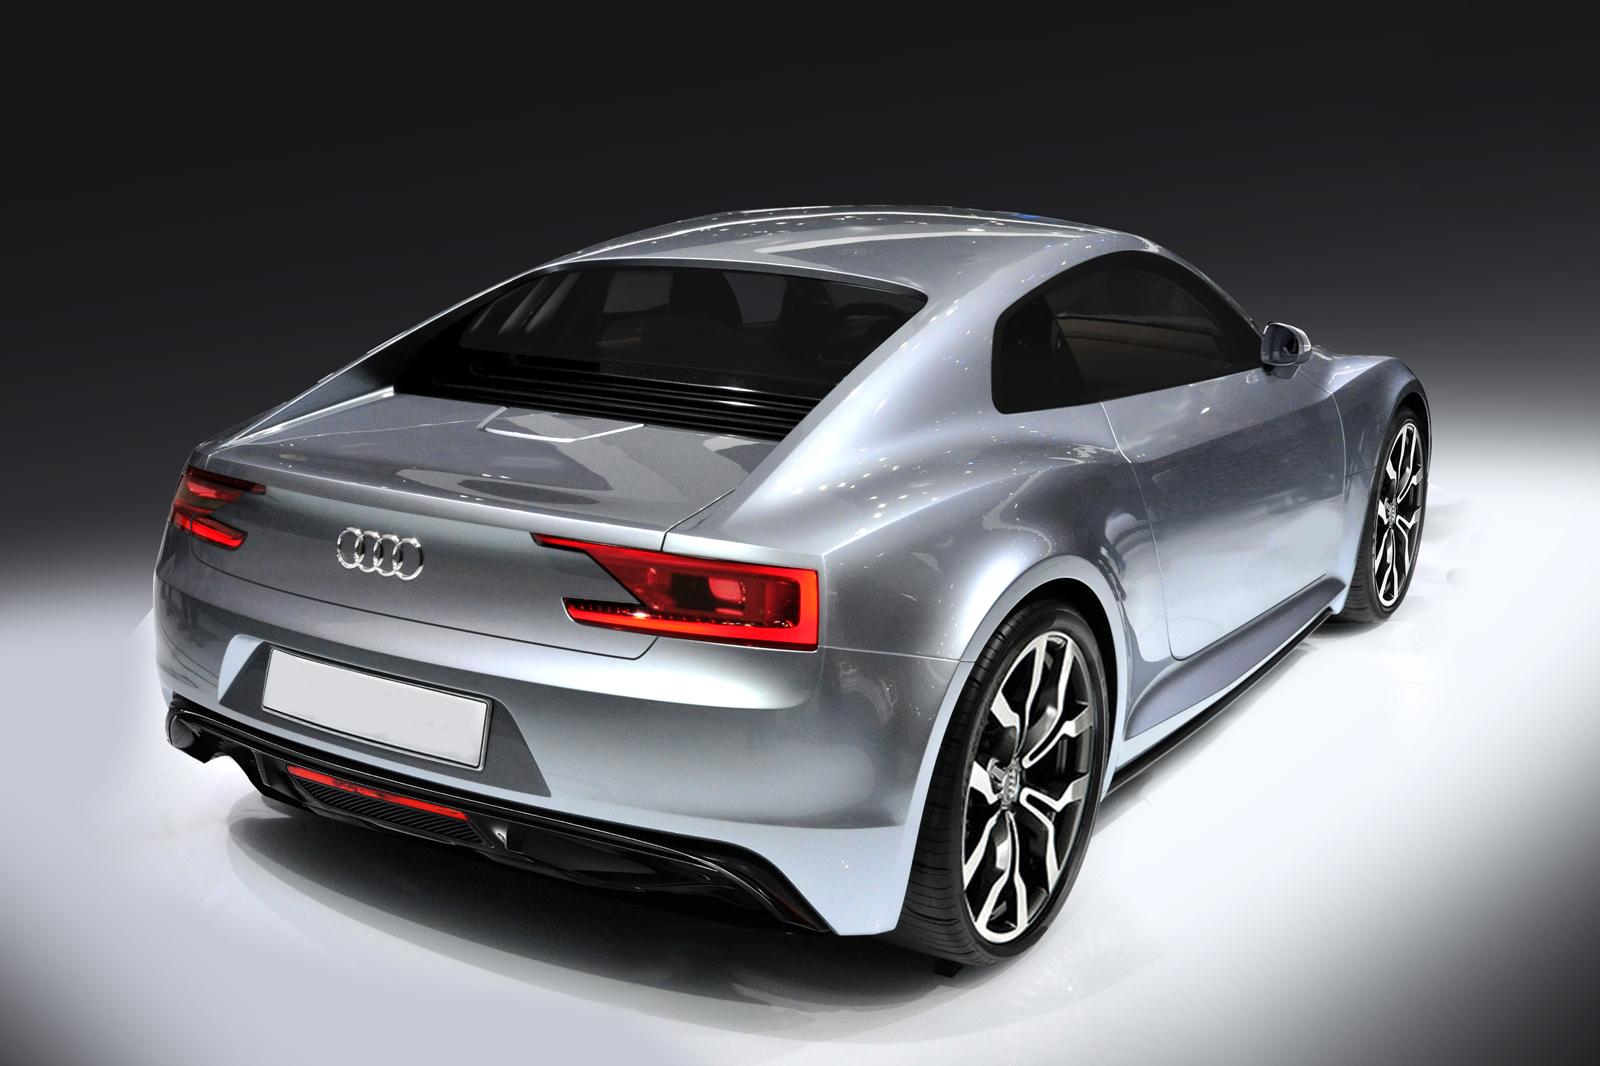 Audi A A Allroad Facelift Unveiled Page Conti Talk - Audi r4